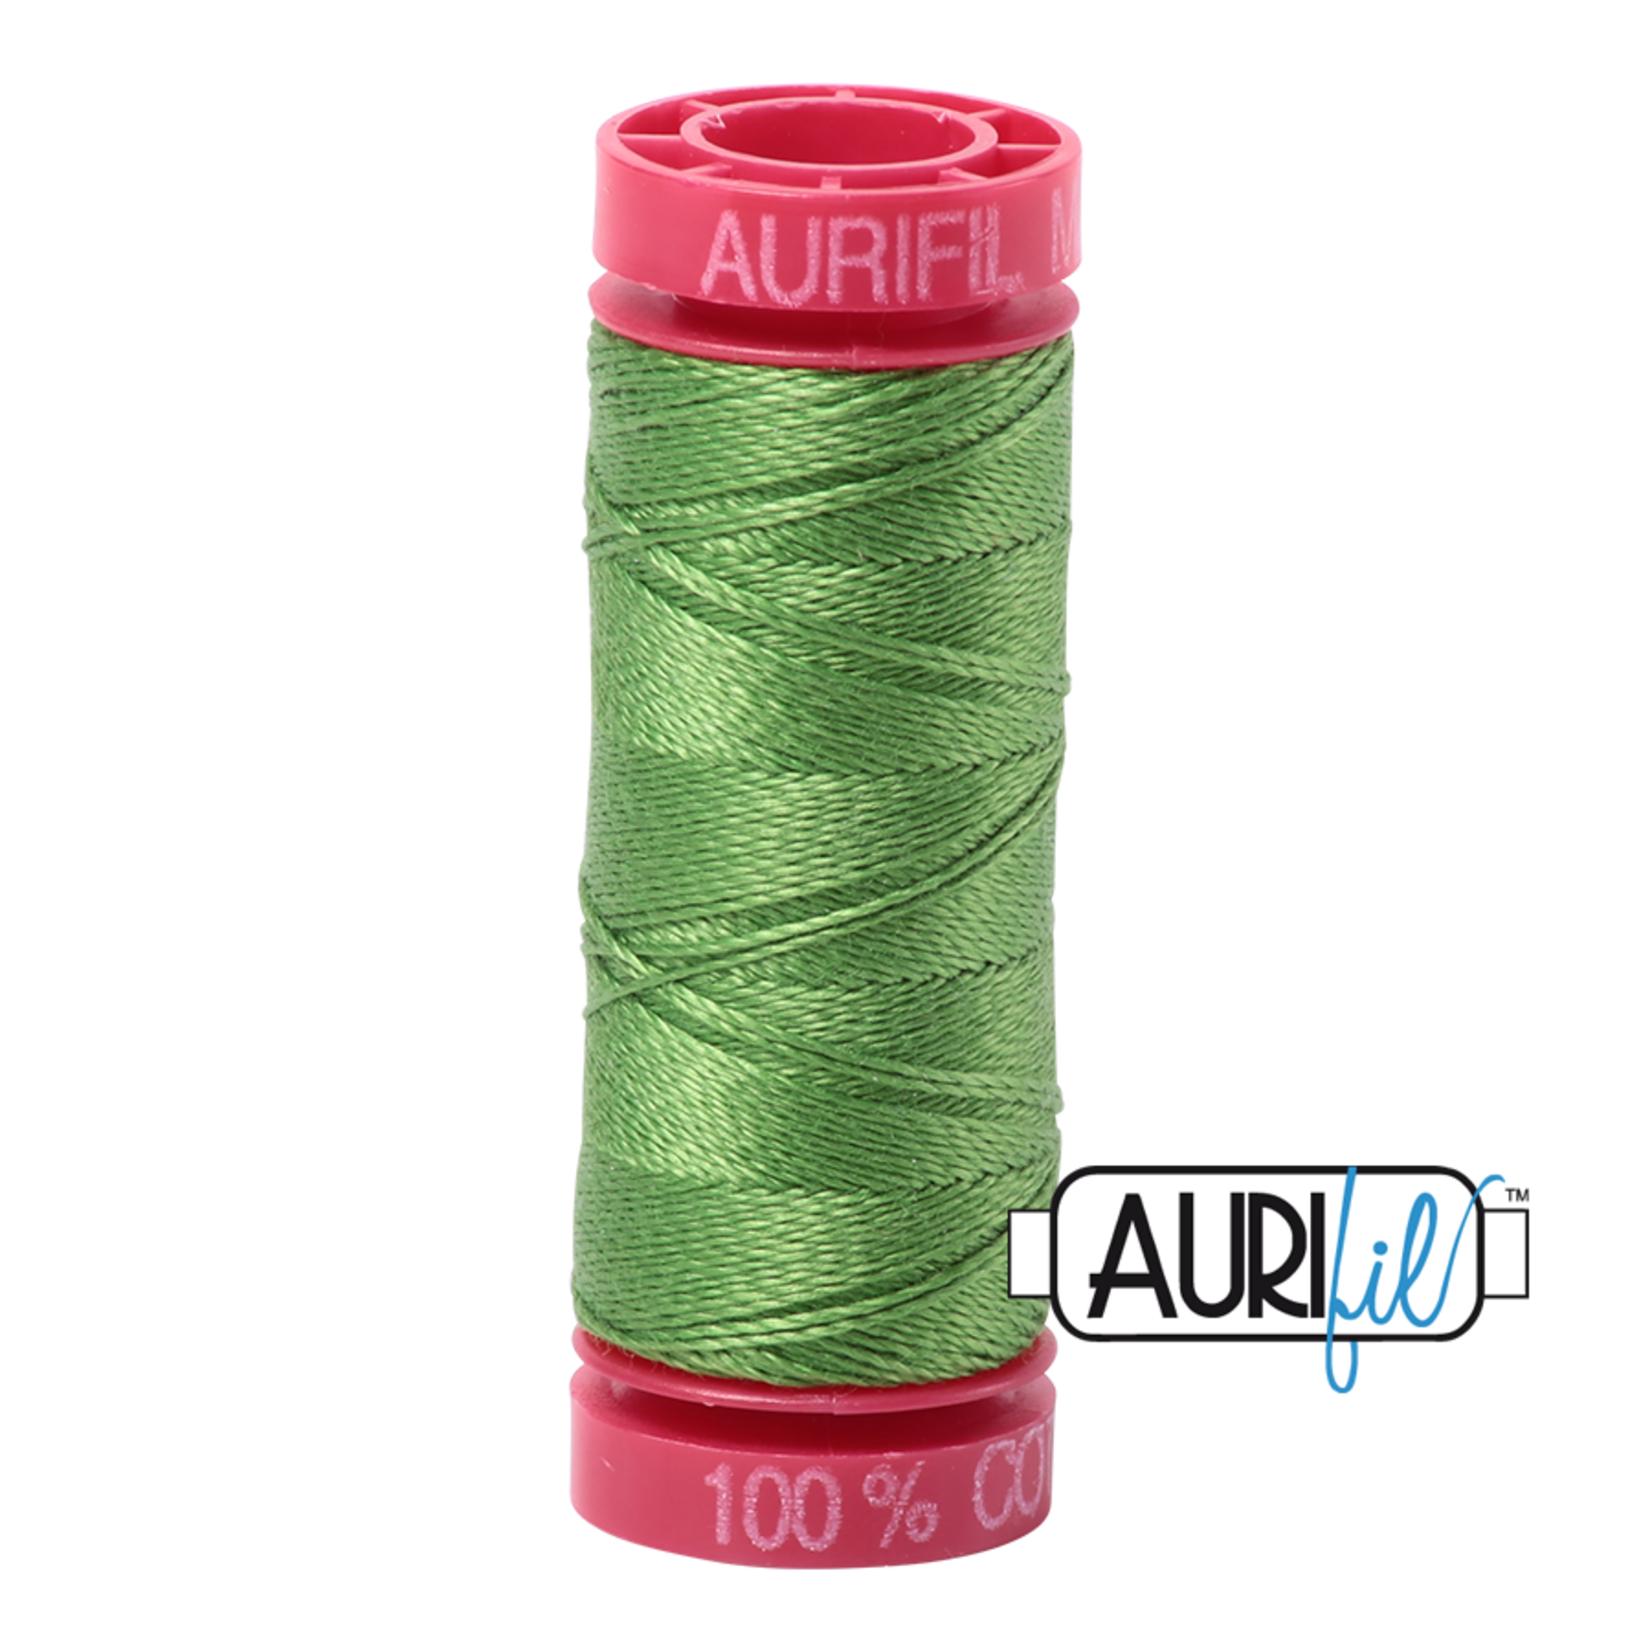 AURIFIL AURIFIL 12 WT Grass Green 1114 Small Spool